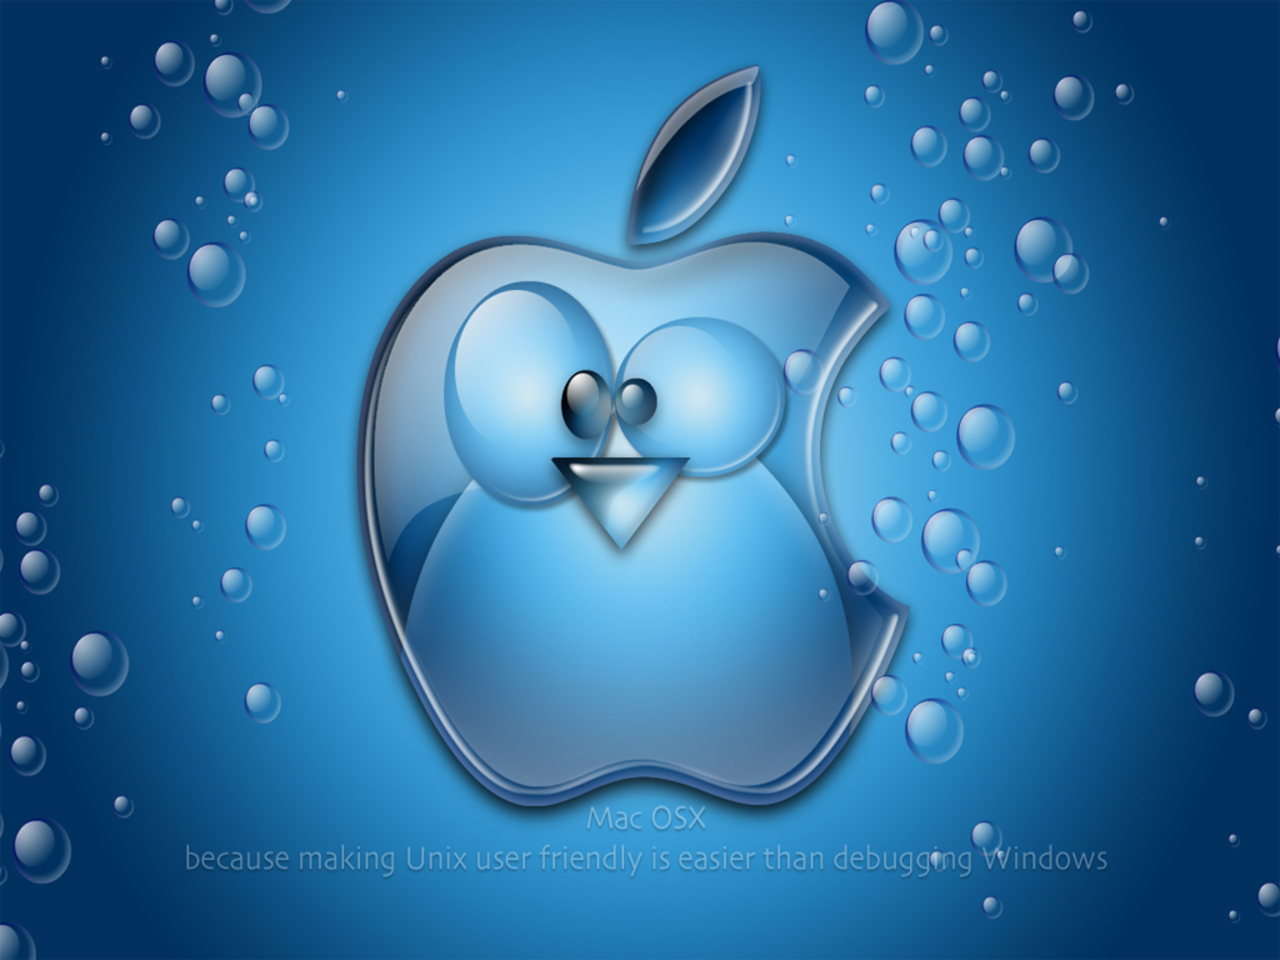 Fondos copados manzana de apple - Protector escritorio ...